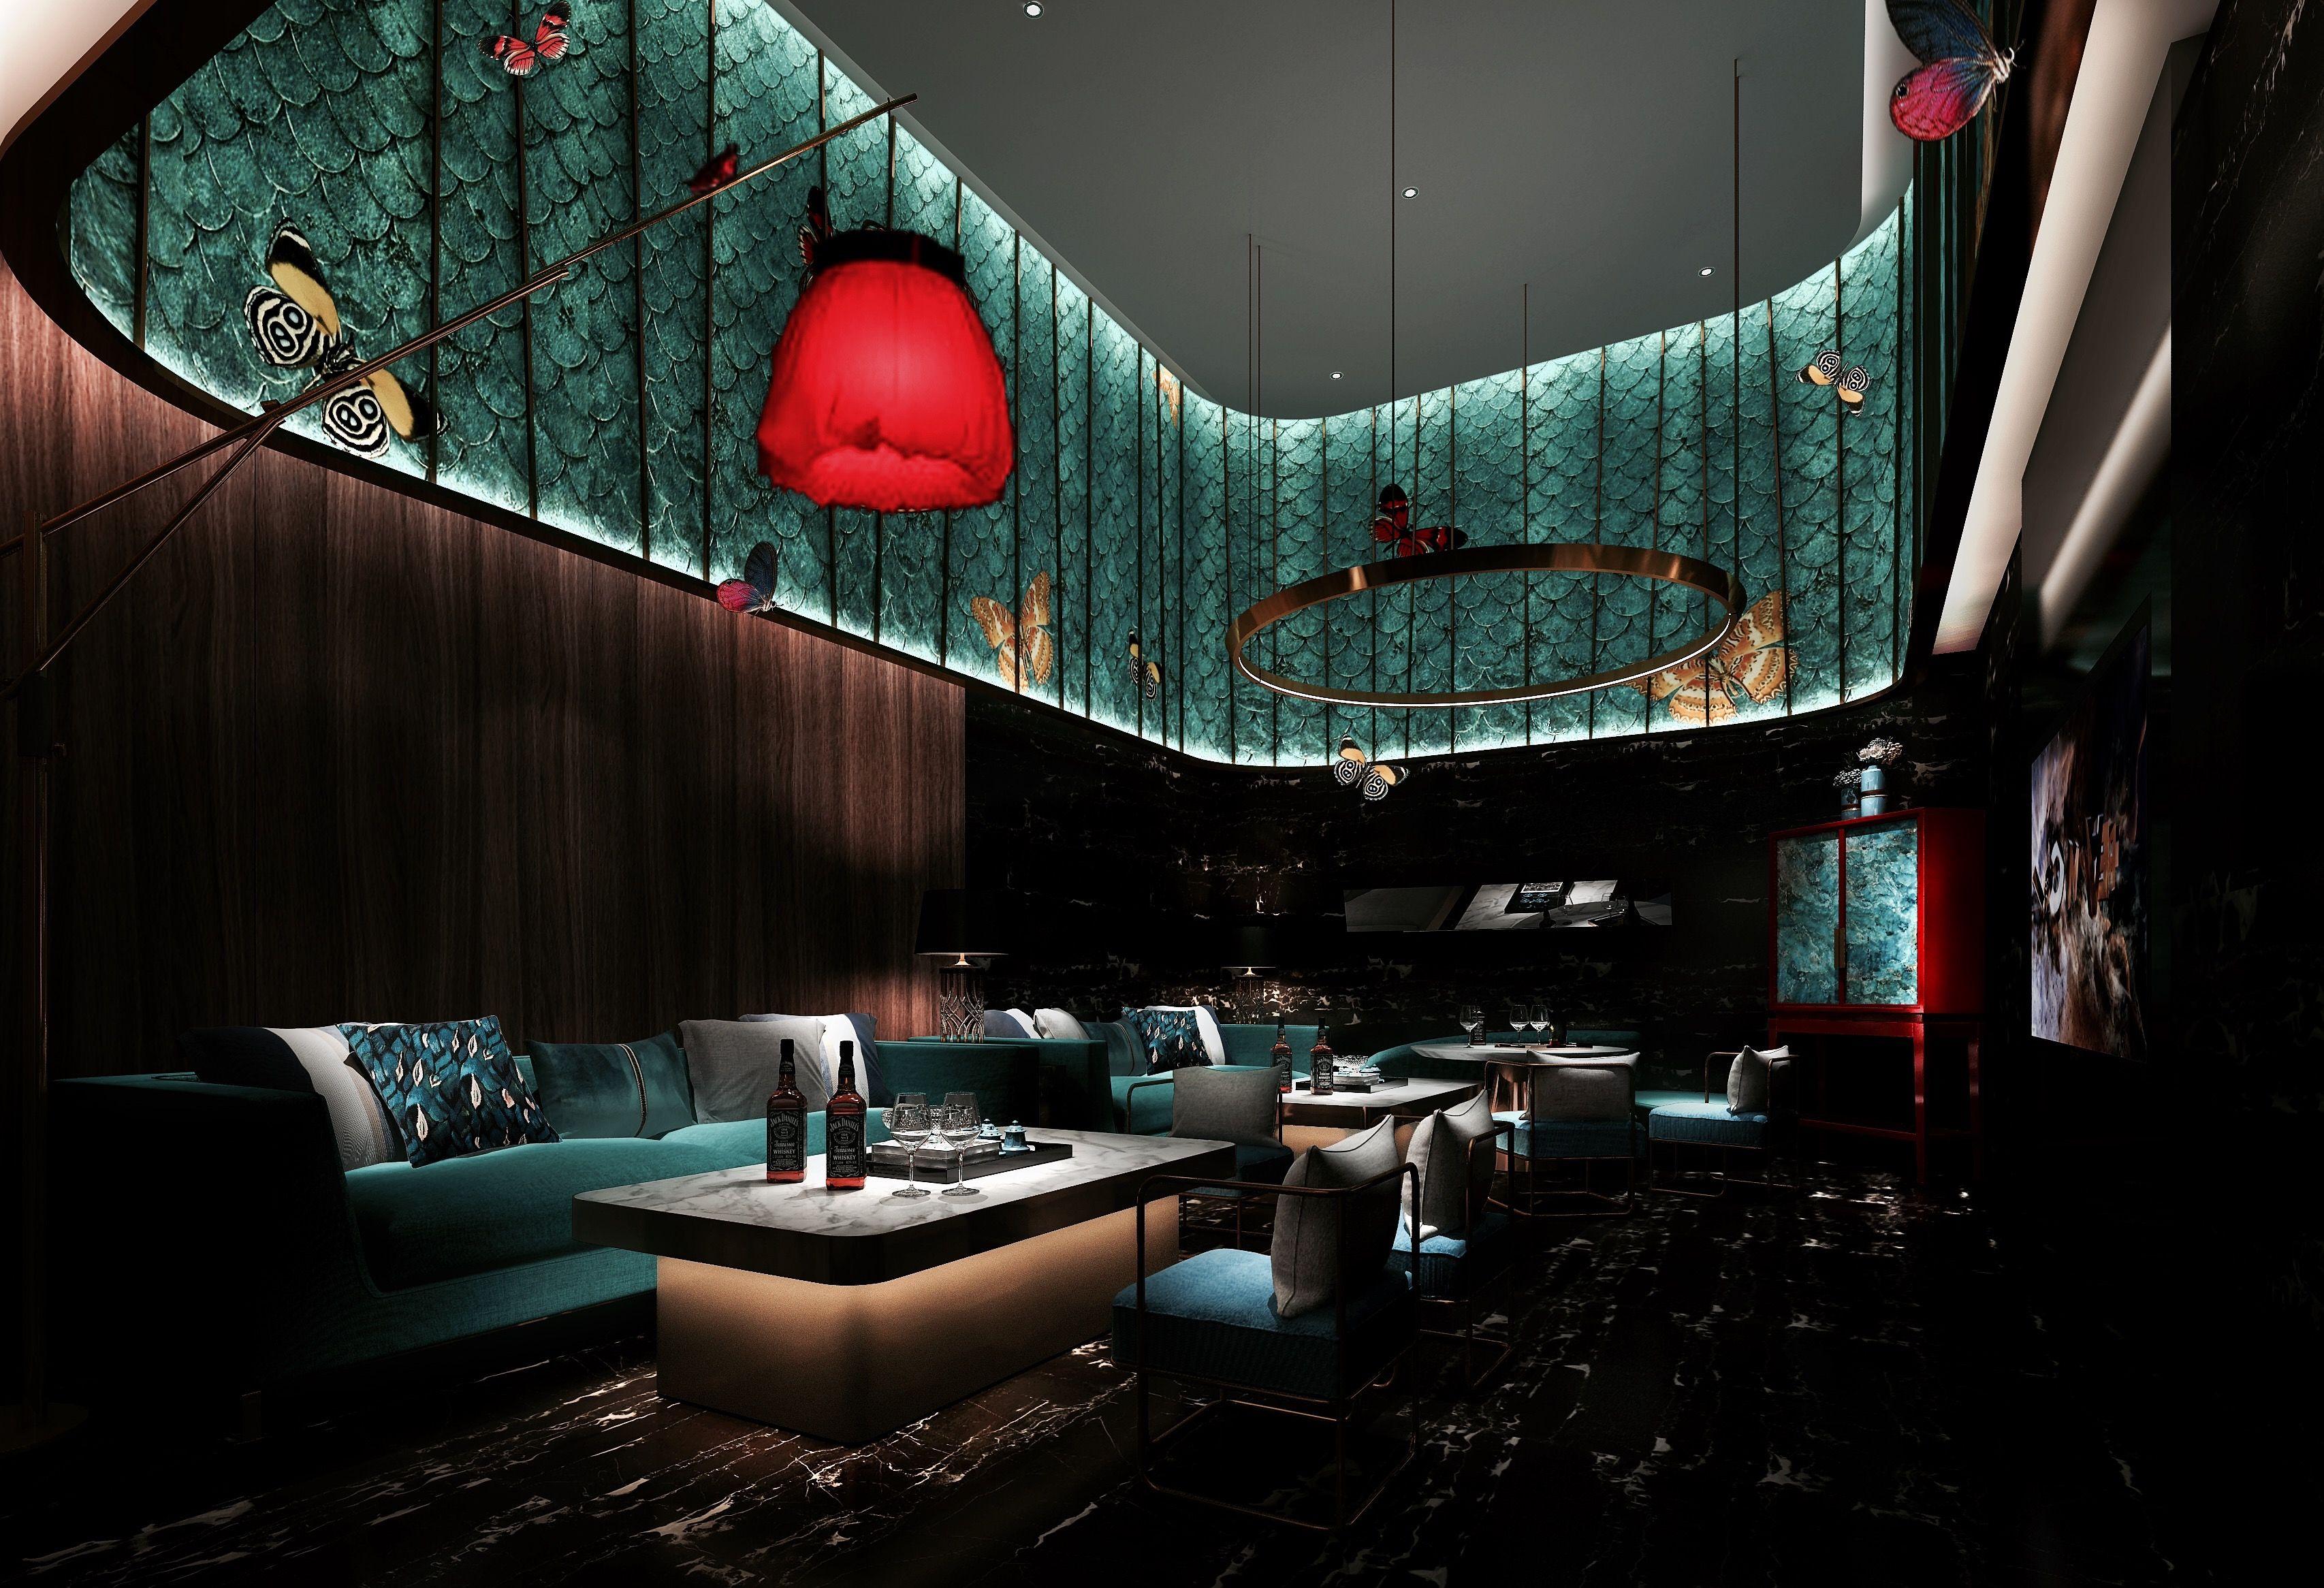 Pin By David Valentim On 餐饮 Space Bar Design Restaurant